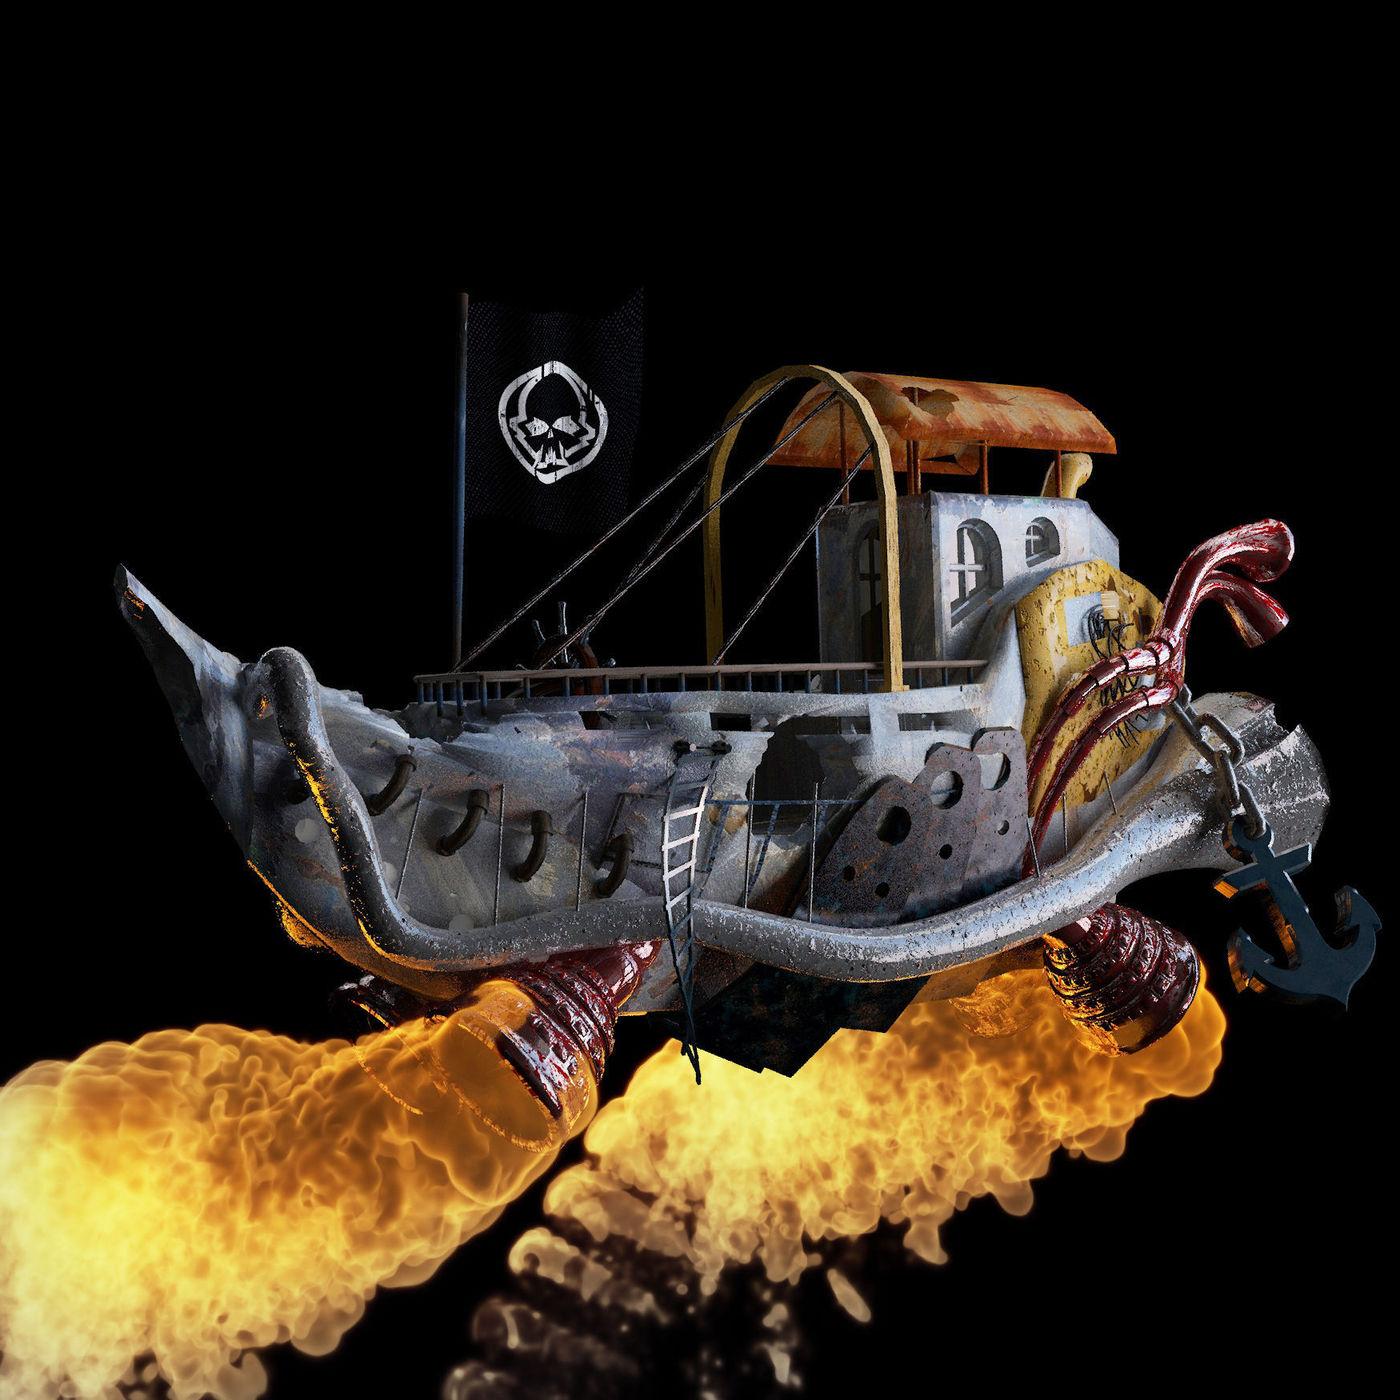 Ship to Neverland